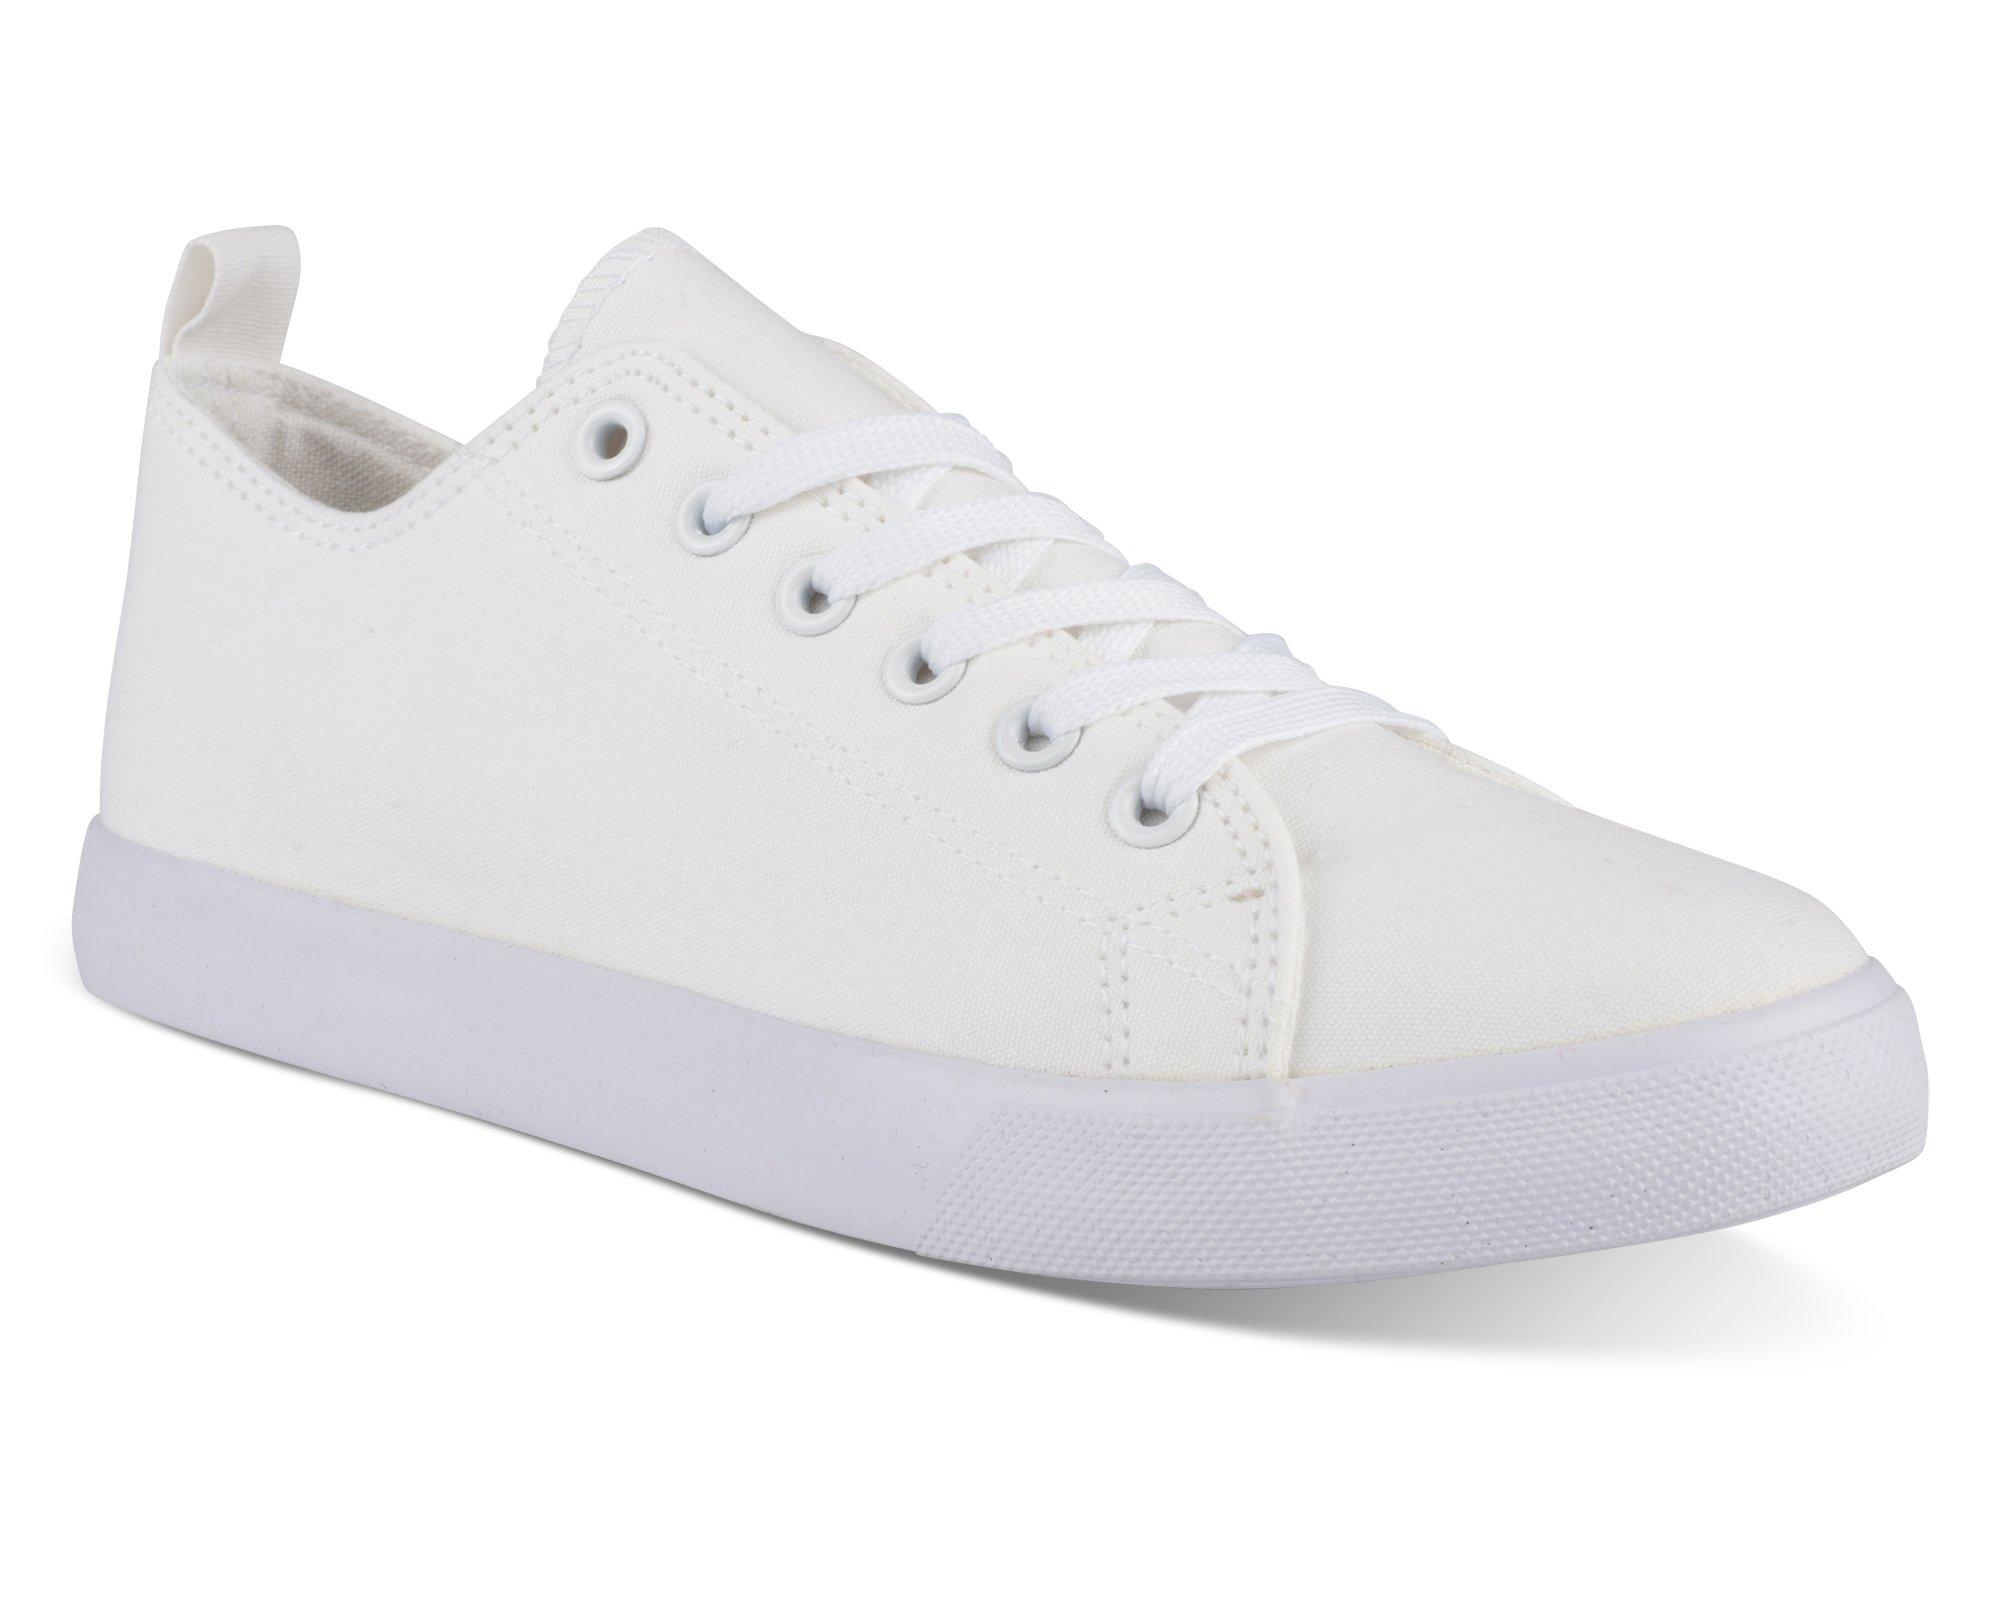 Twisted Women's KIX Canvas Casual Sneakers - KIXLO292WHITE, Size 9